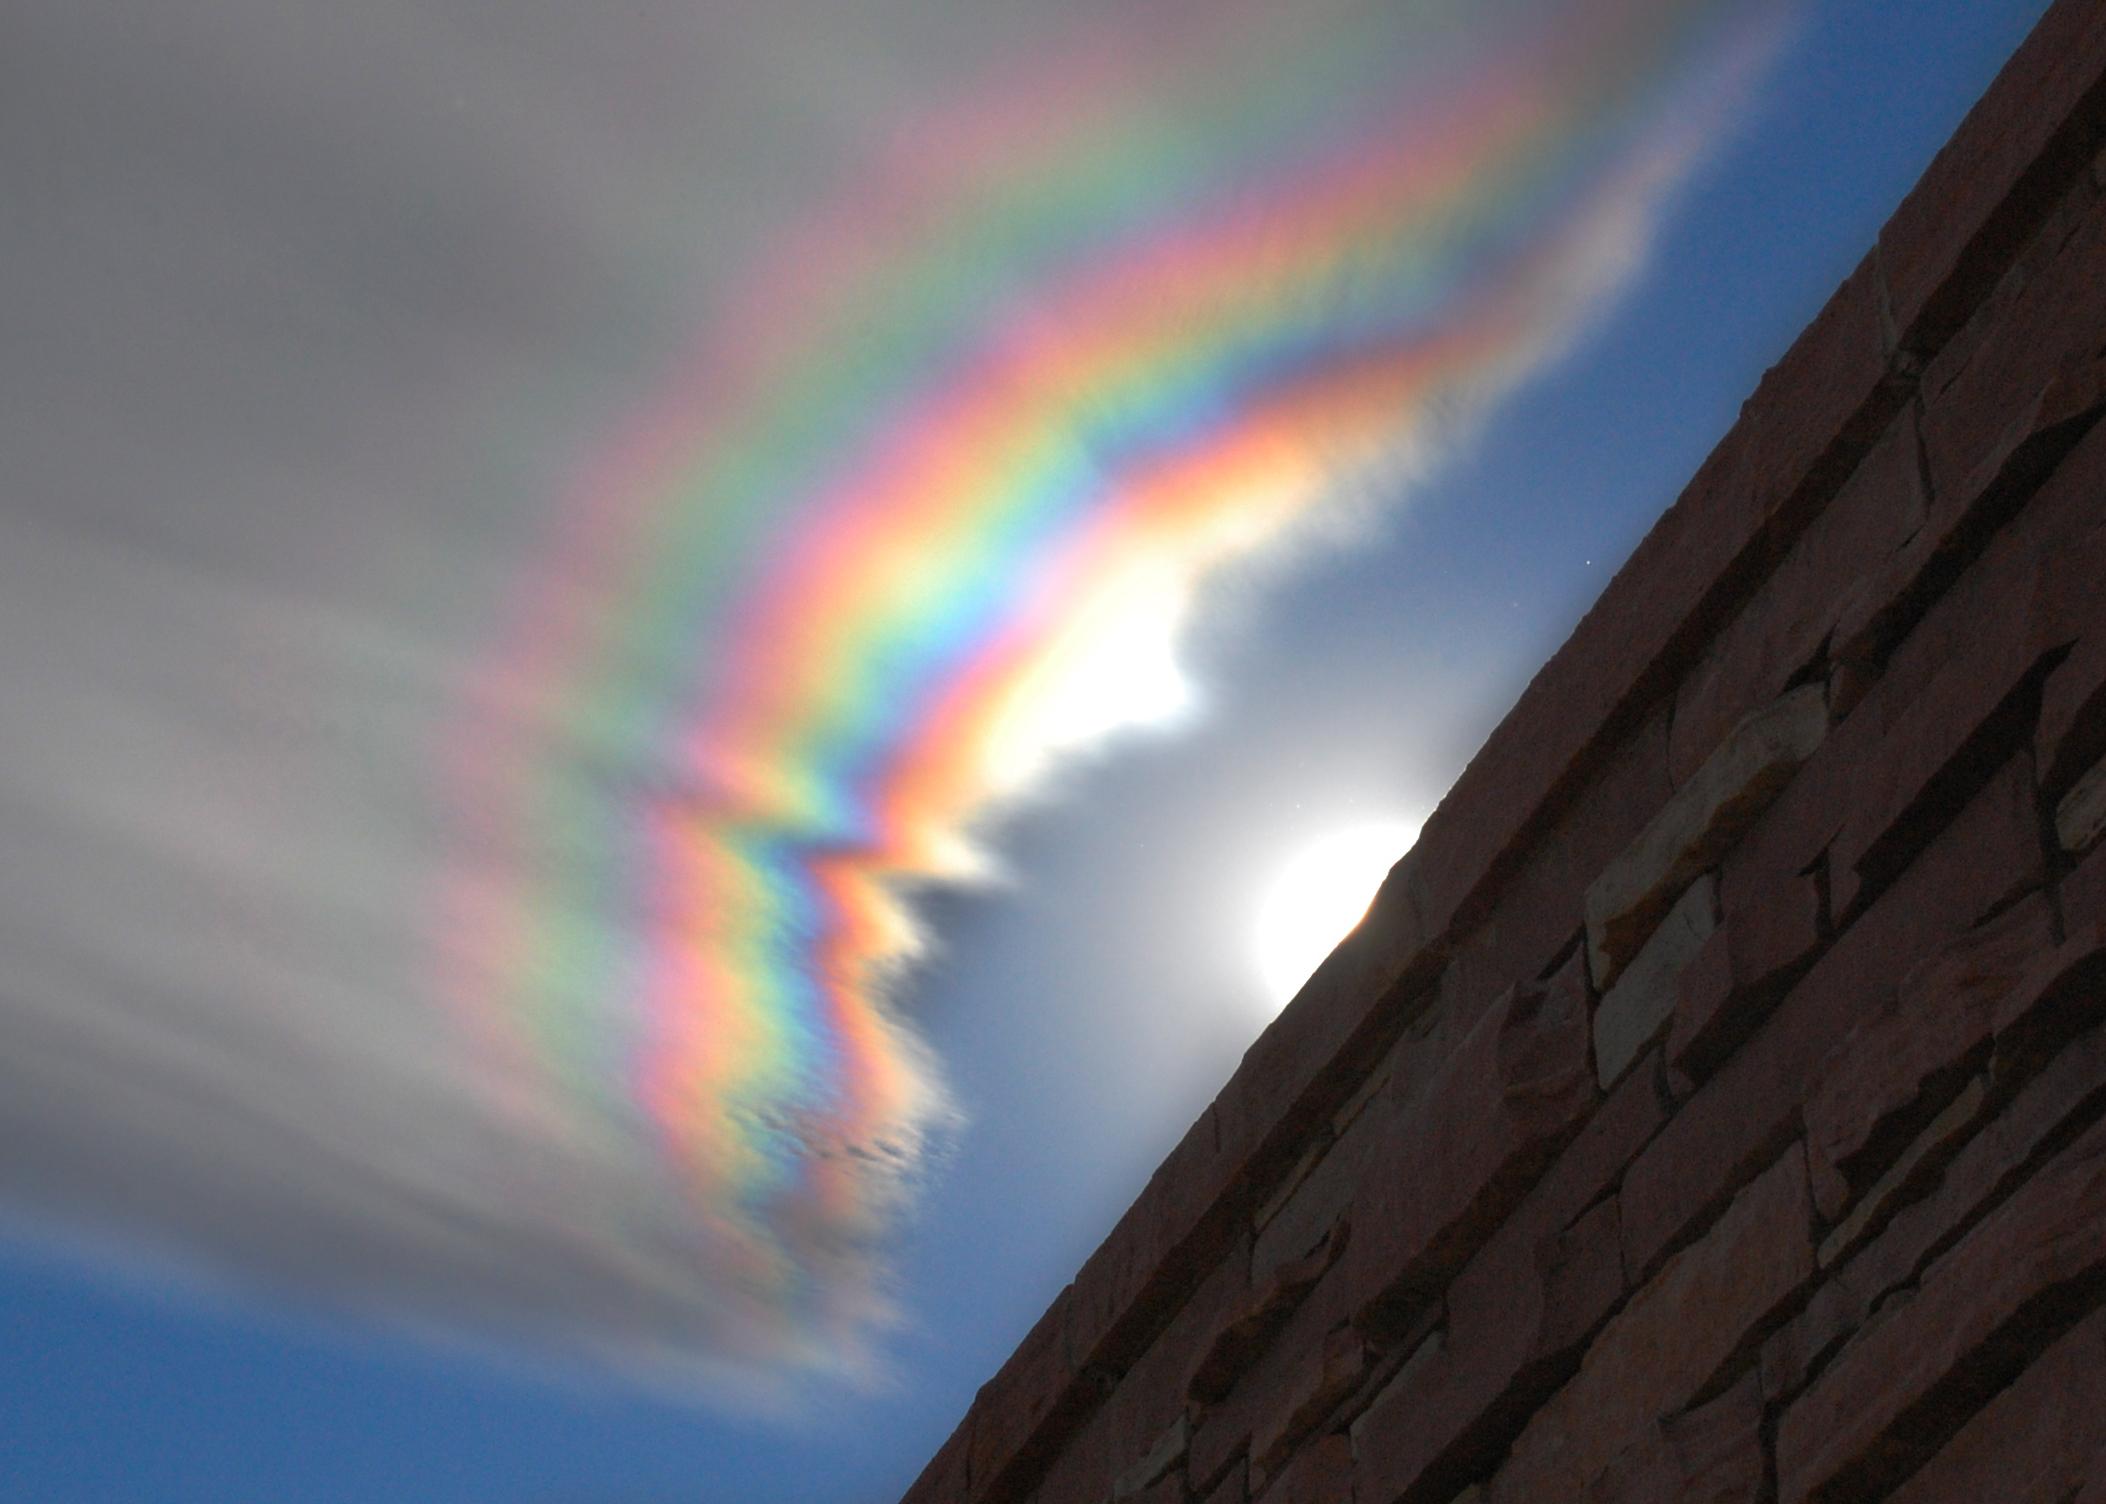 Nuage irisé au-dessus du Colorado